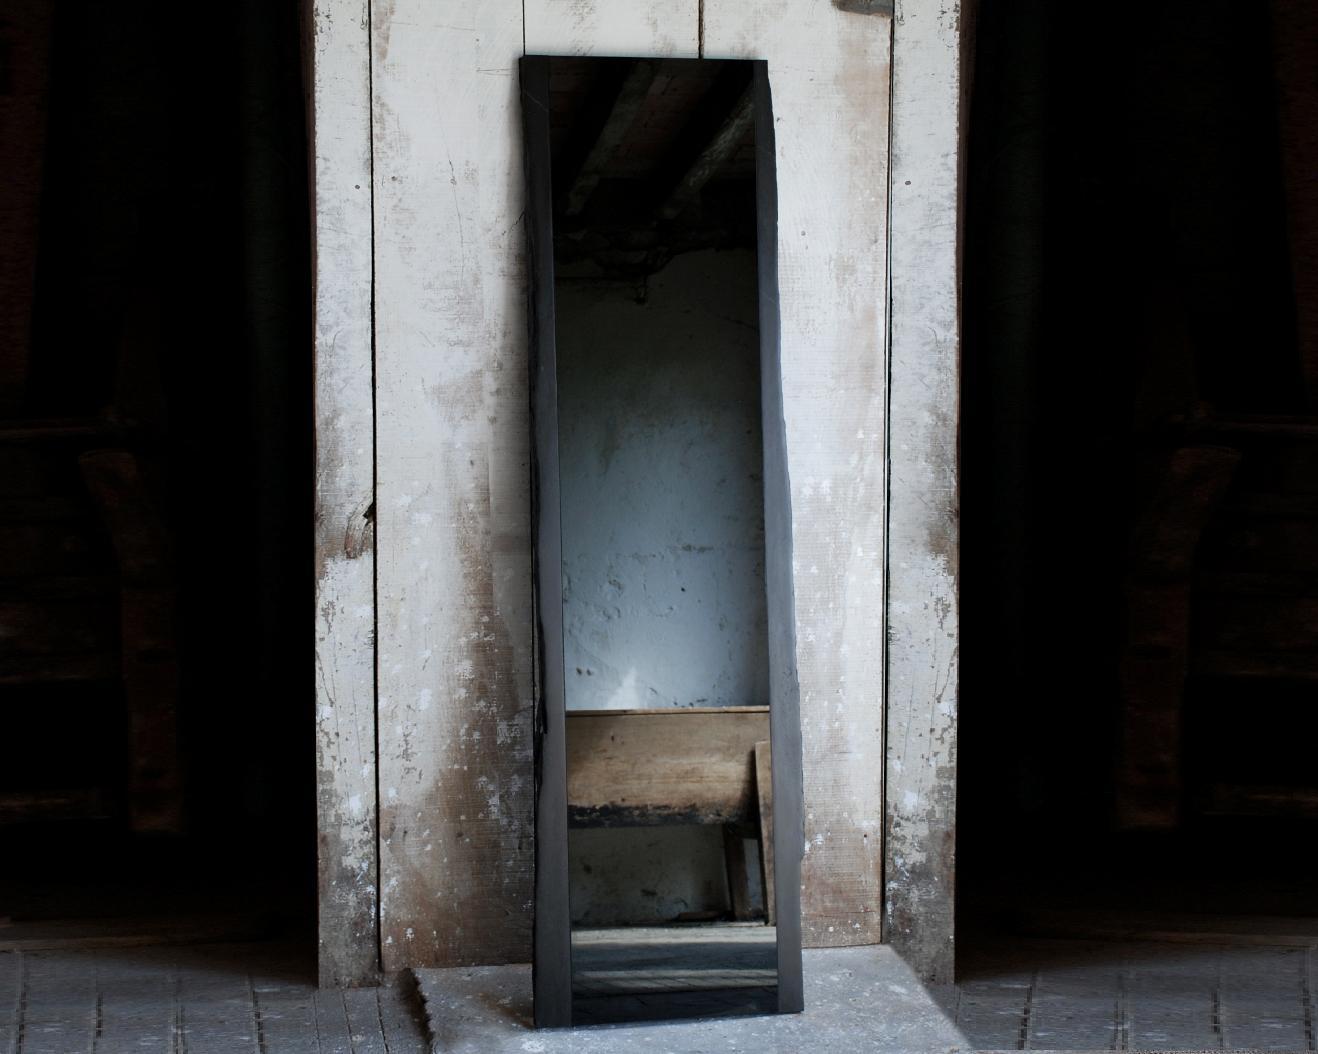 Narcisse-Miroir-Frederic-Saulou-Design-1